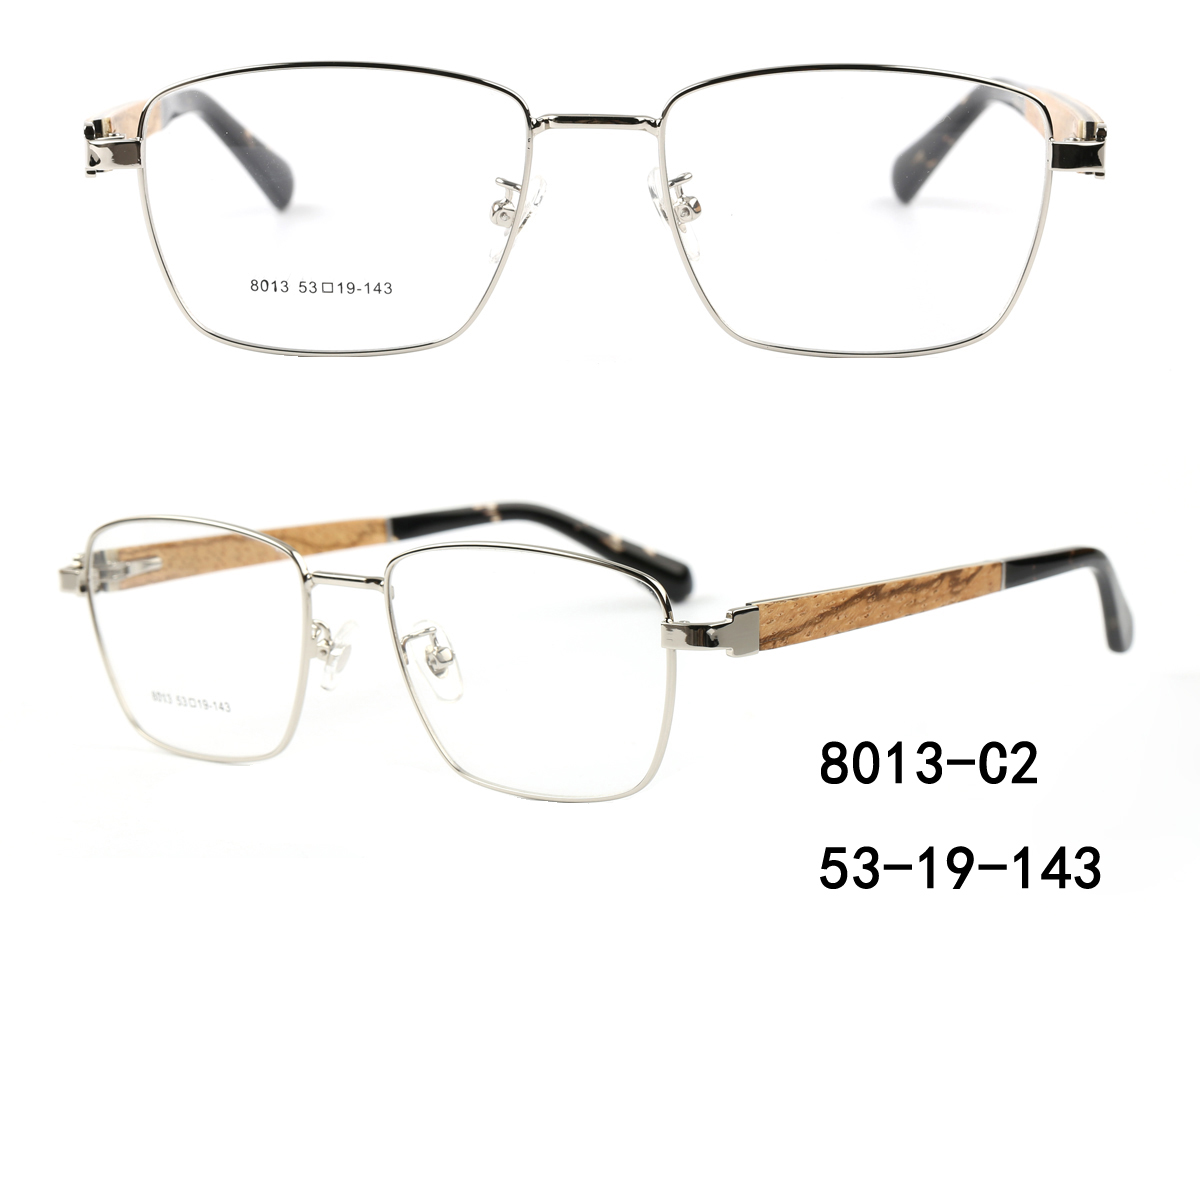 Square Metal Eyewear Frames Wholesale,Unisex Optical Acetate Frames Supplier